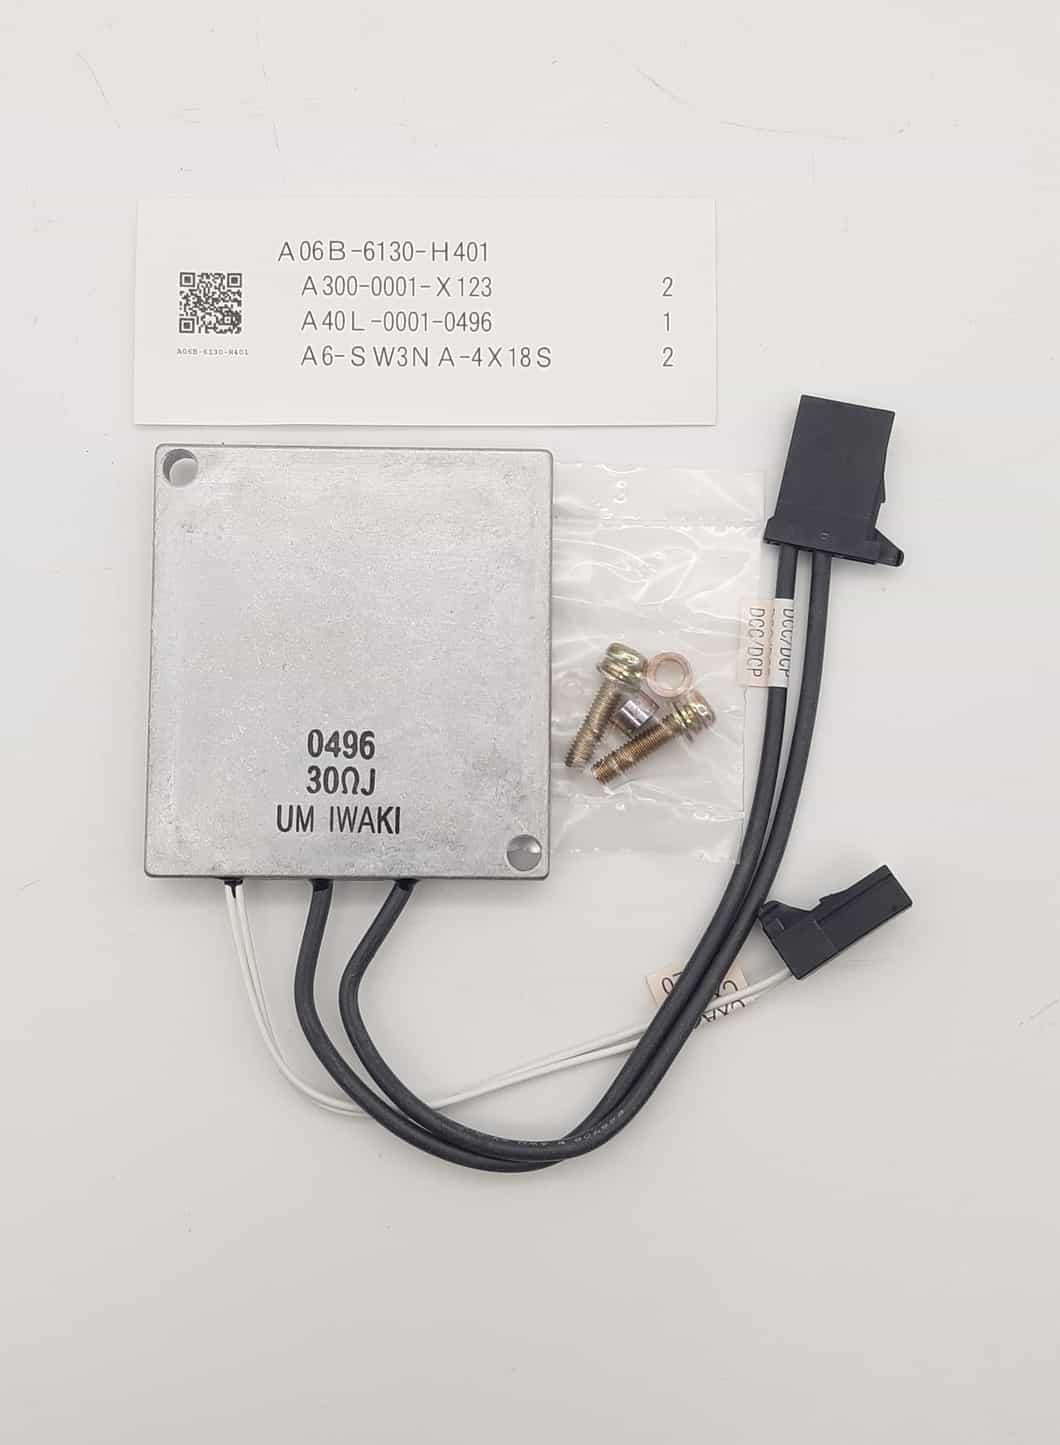 A06B-6130-H401 | RESISTOR | FANUC